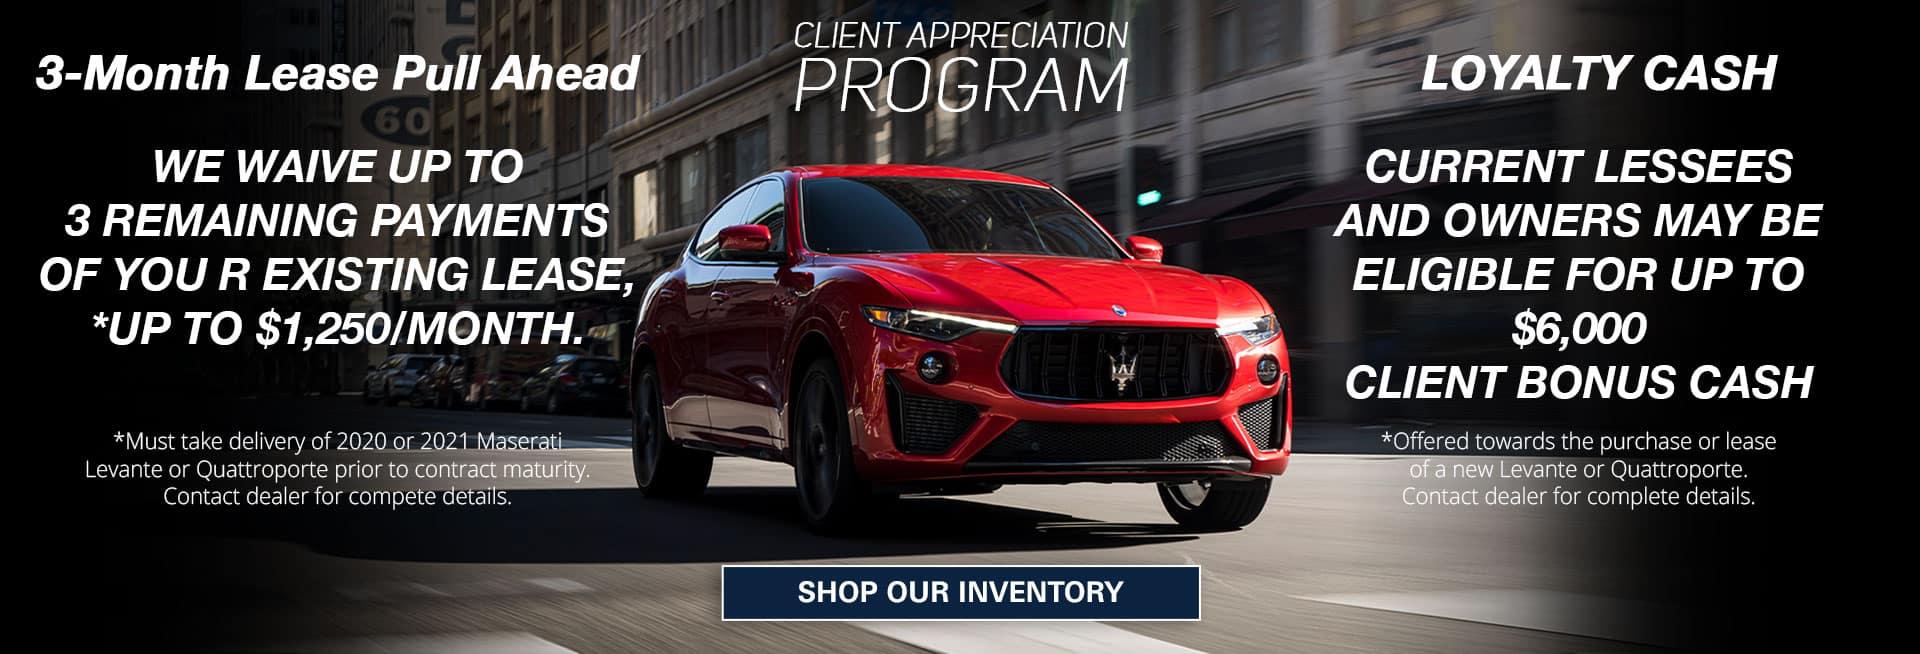 Maserati loyalty program offers